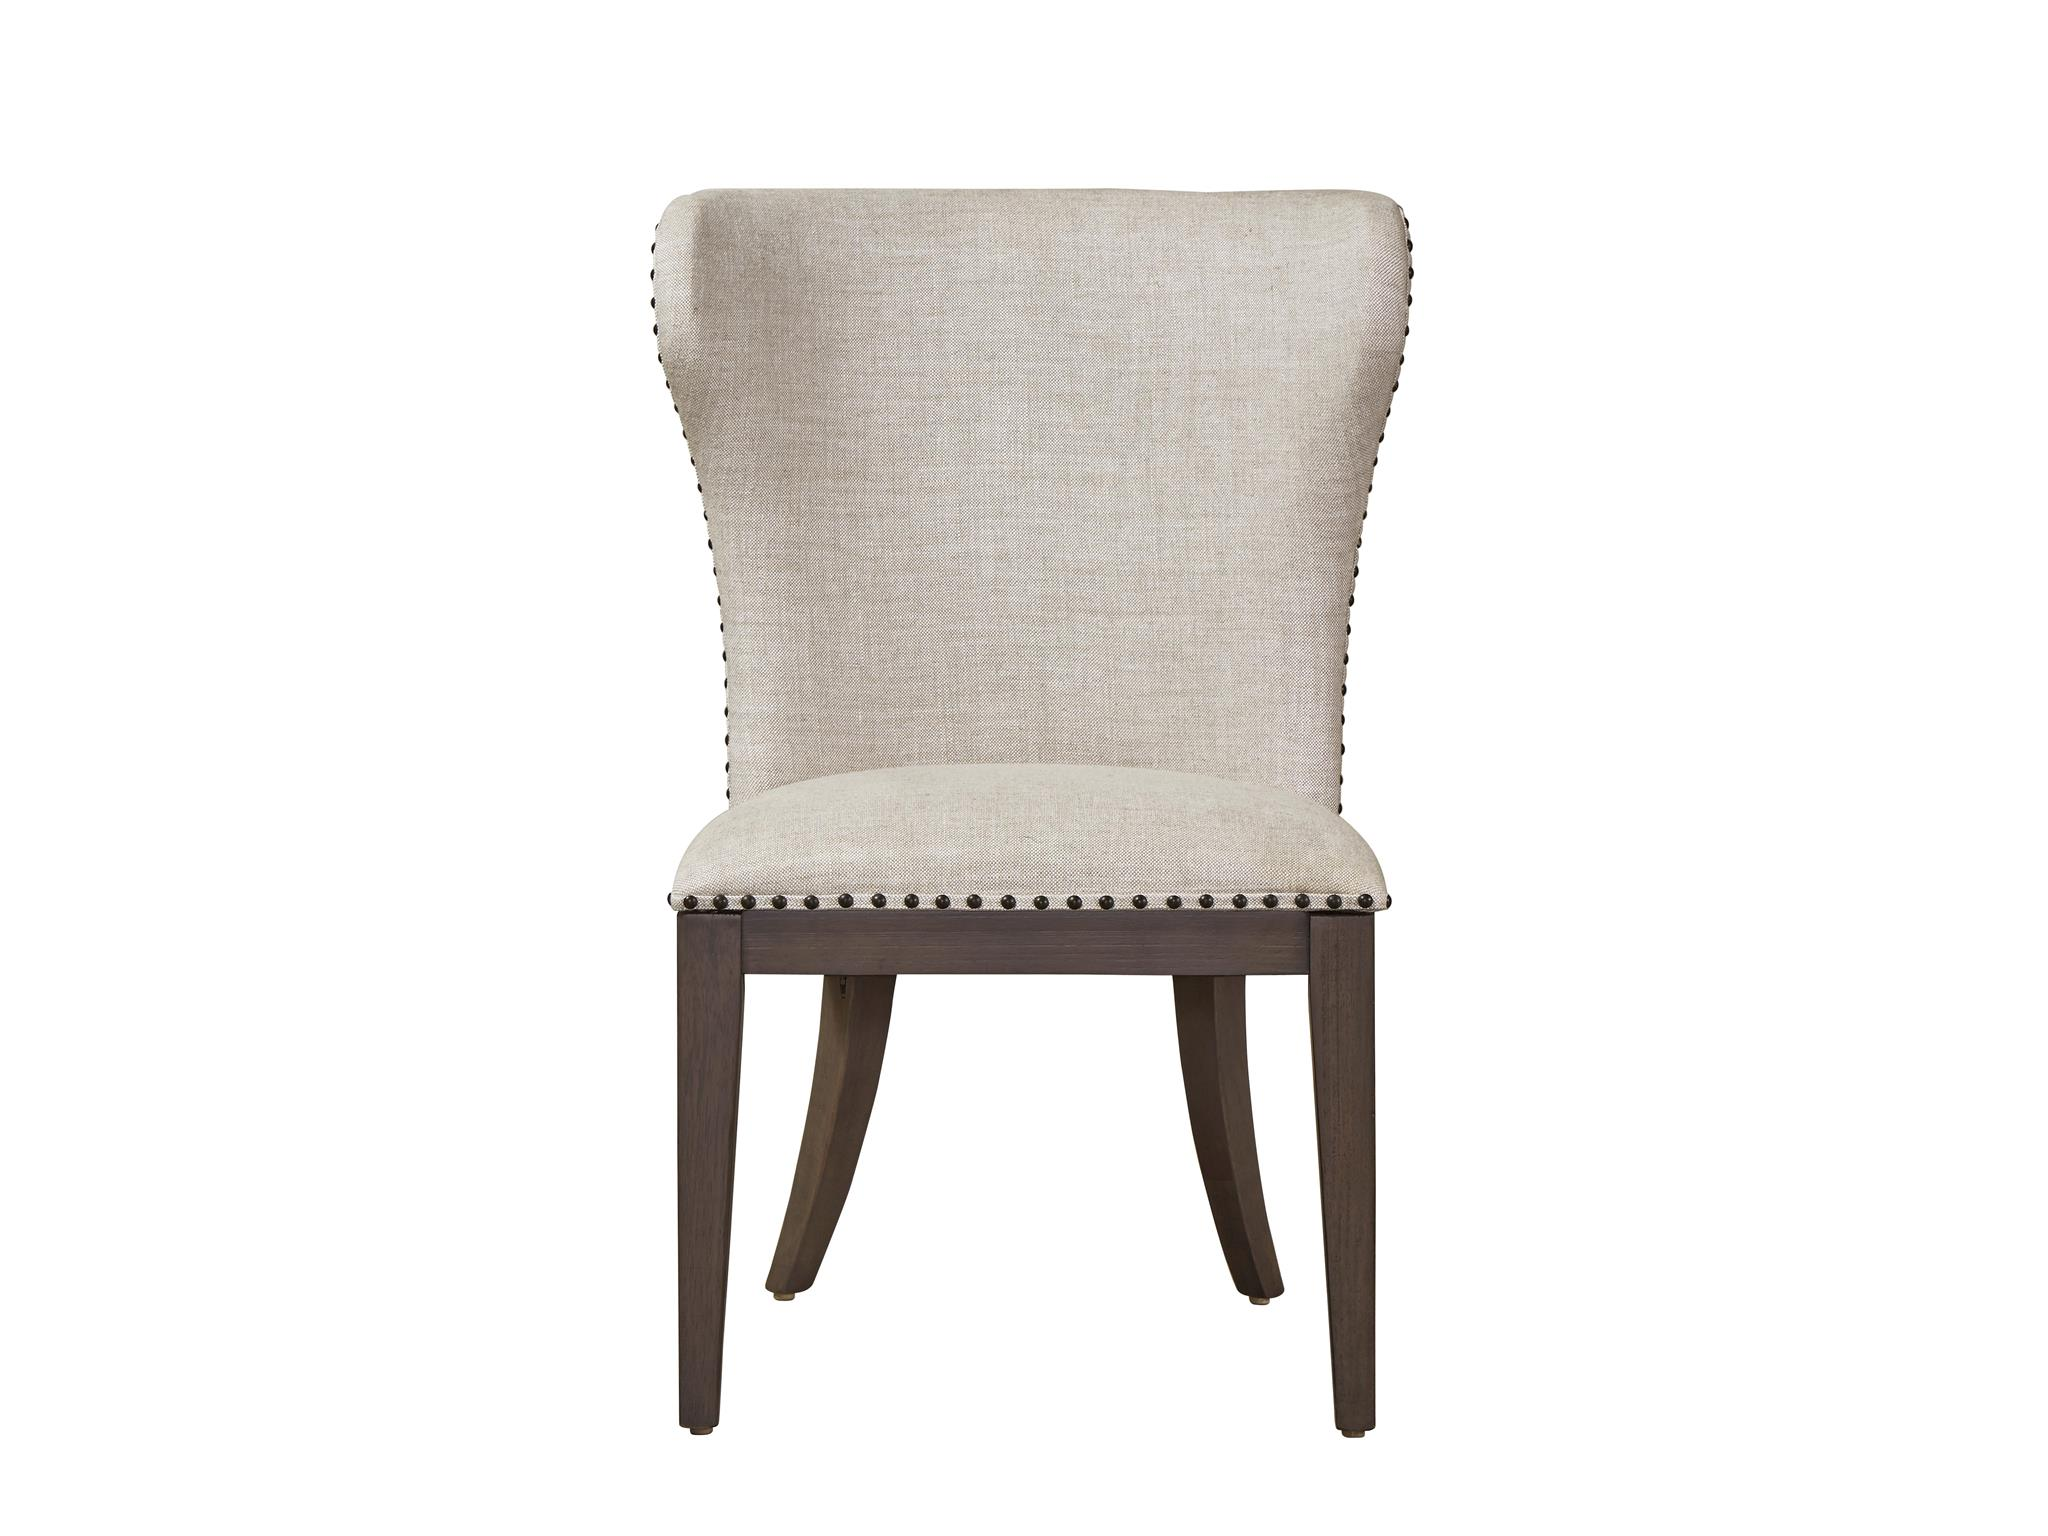 Curated Baldwin Chair 552738-RTA